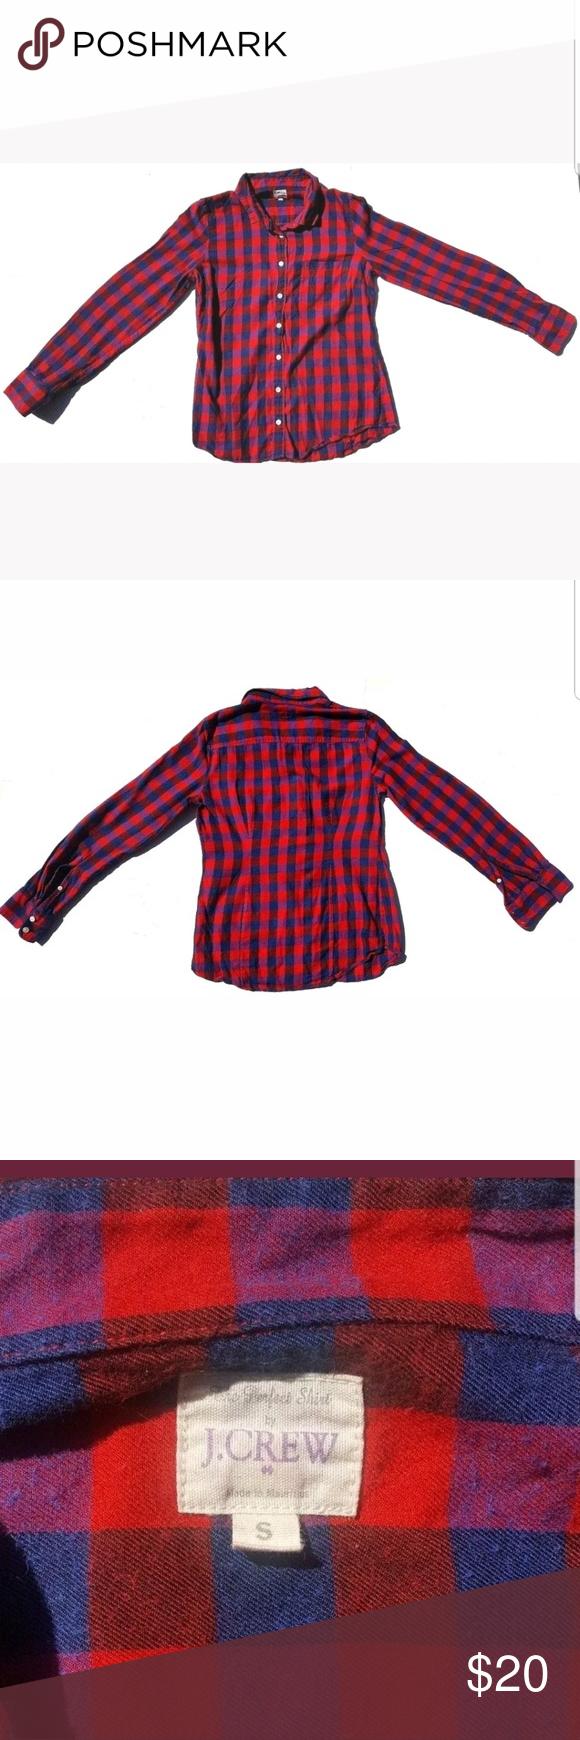 Navy blue flannel shirt womens  J Crew Womenus Shirt Button Down Size Small J Crew Womenus Shirt